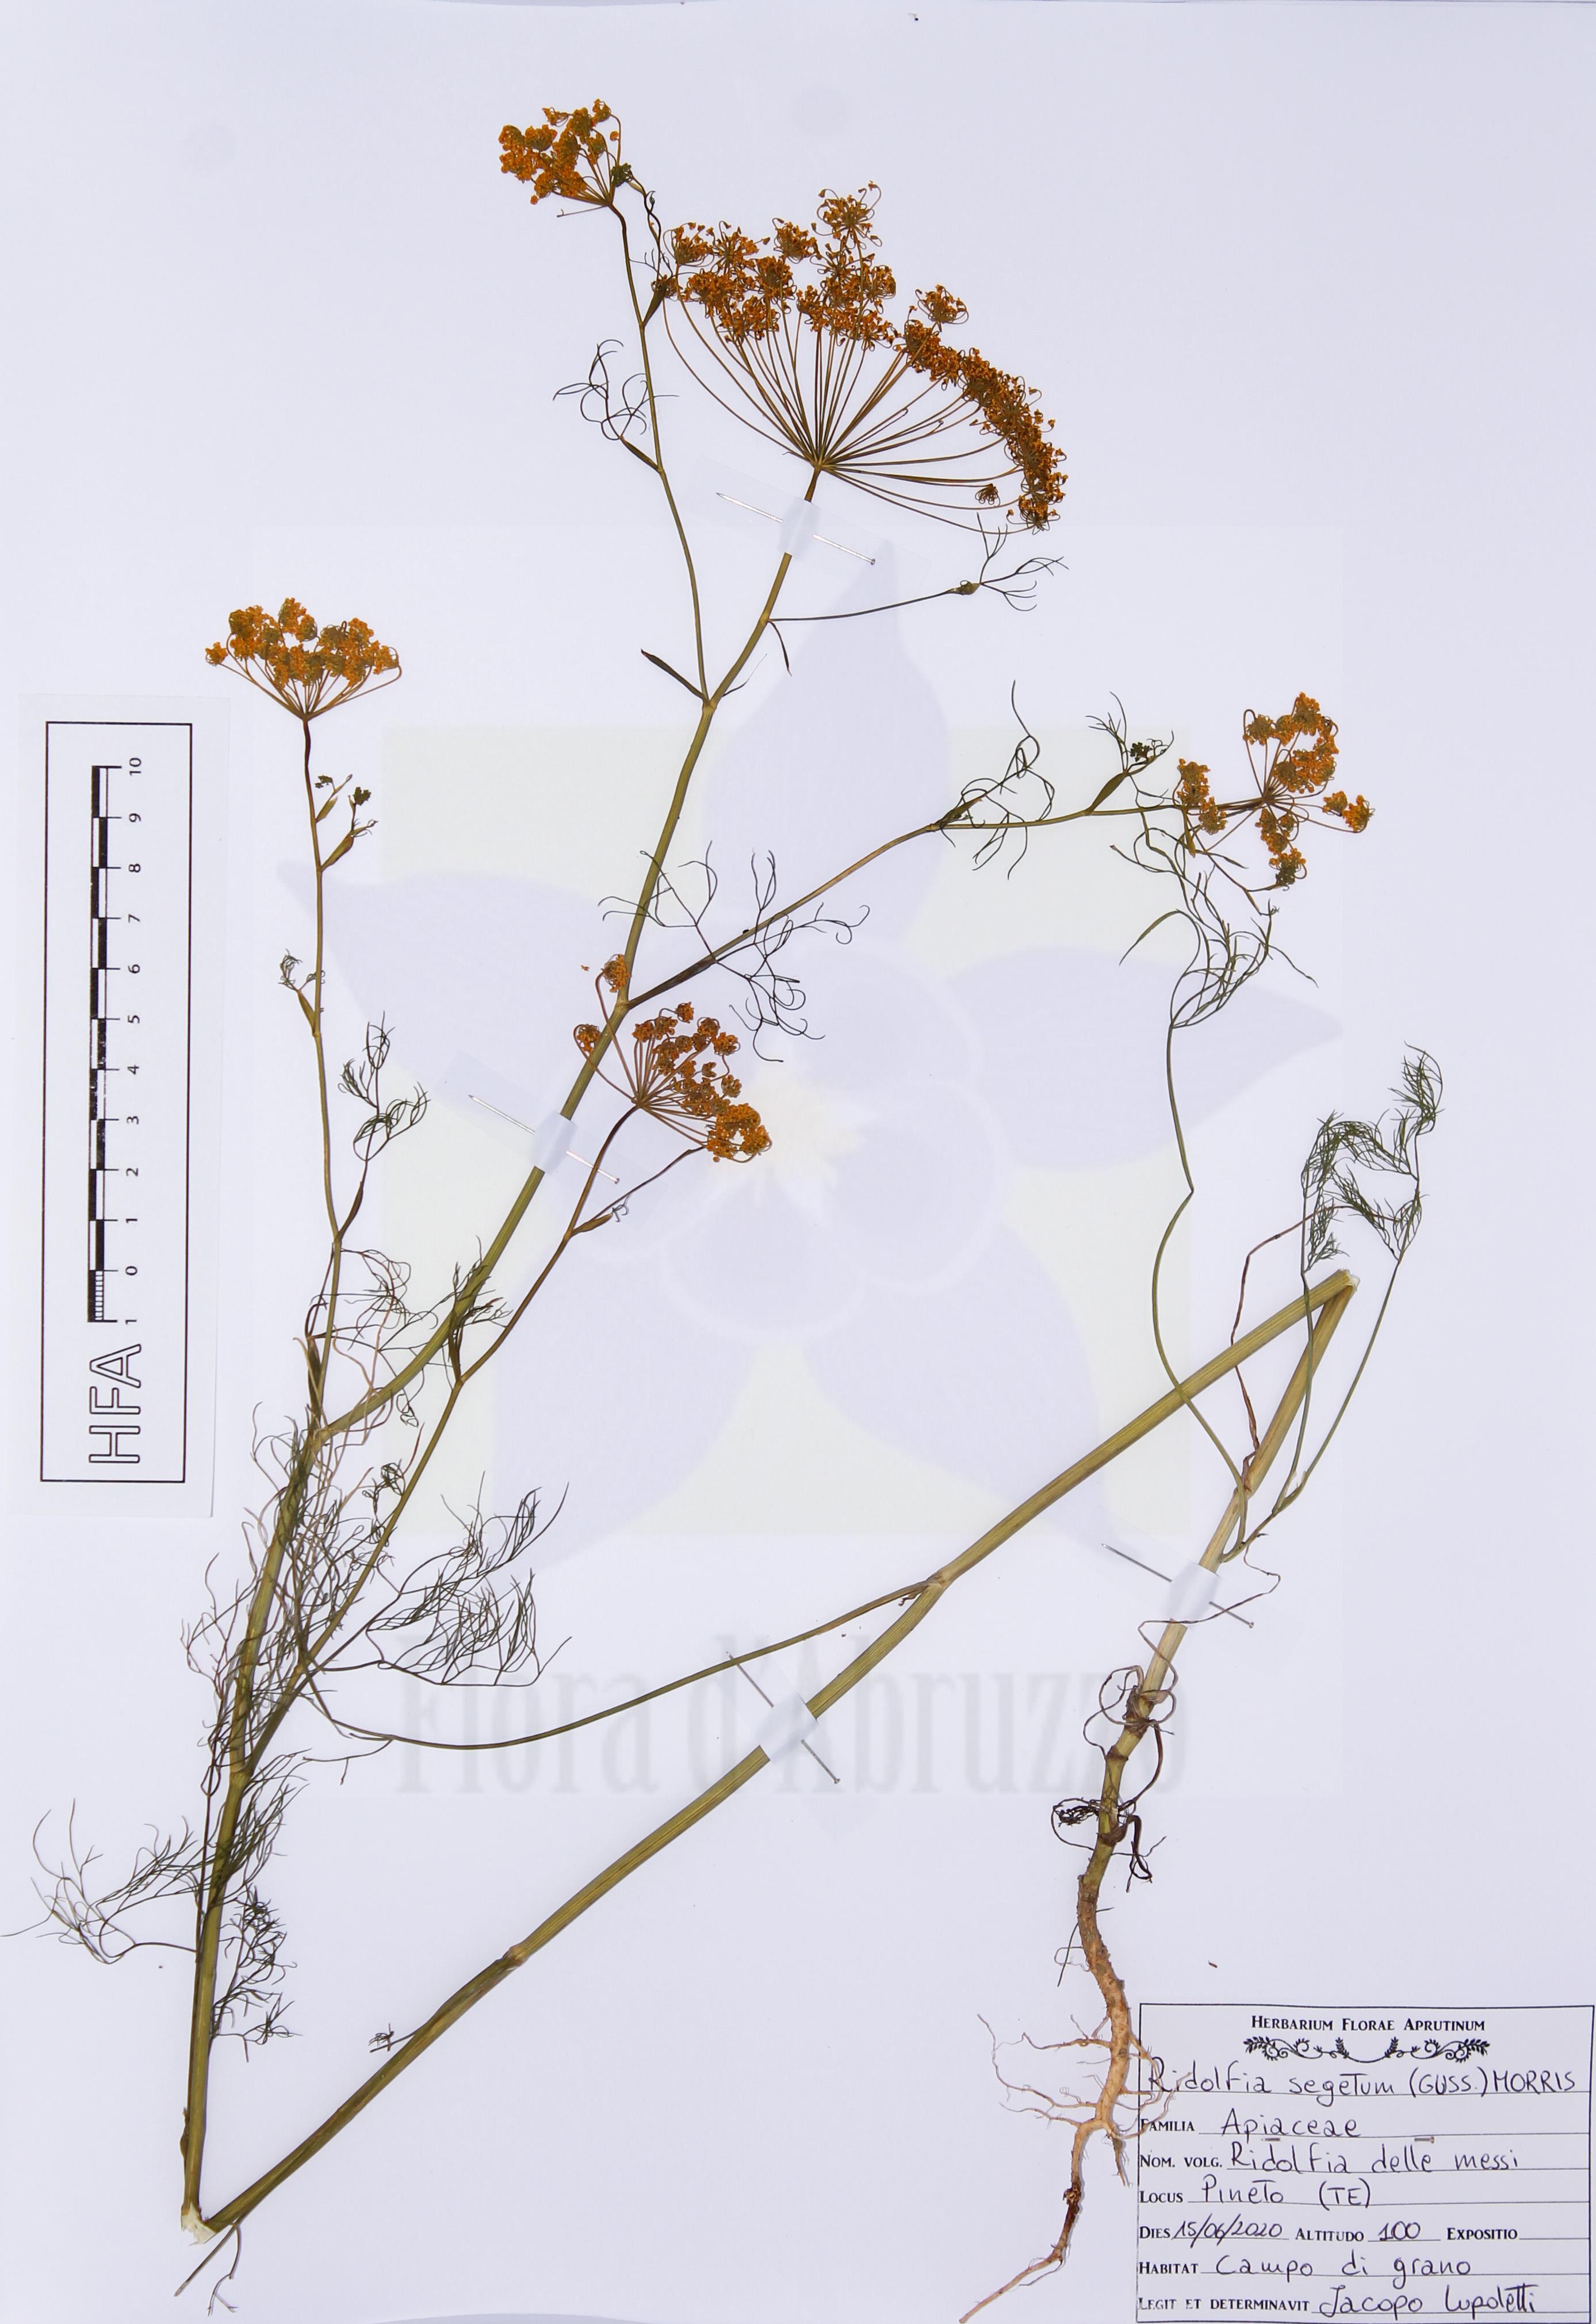 Ridolfia segetum(Guss.) Moris